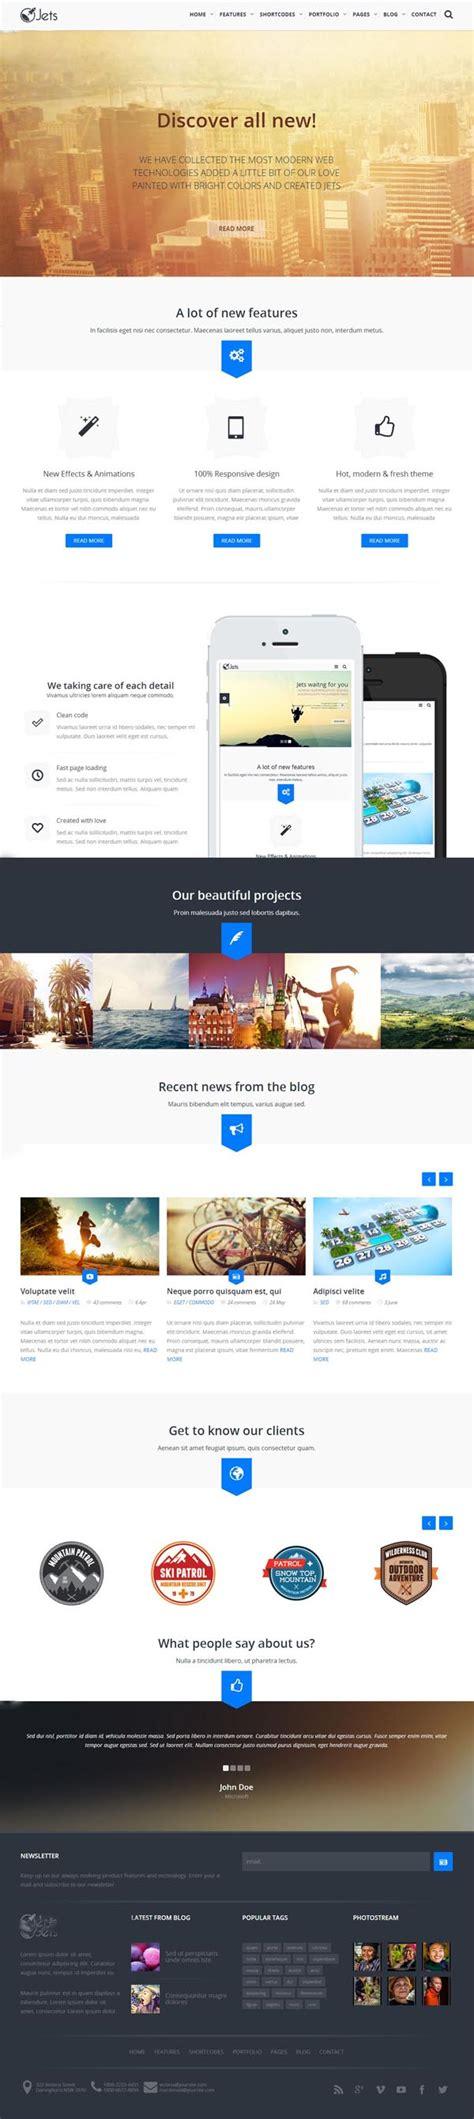 Html5 Responsive Website Templates Web Design Graphic Design Junction Modern Responsive Website Templates